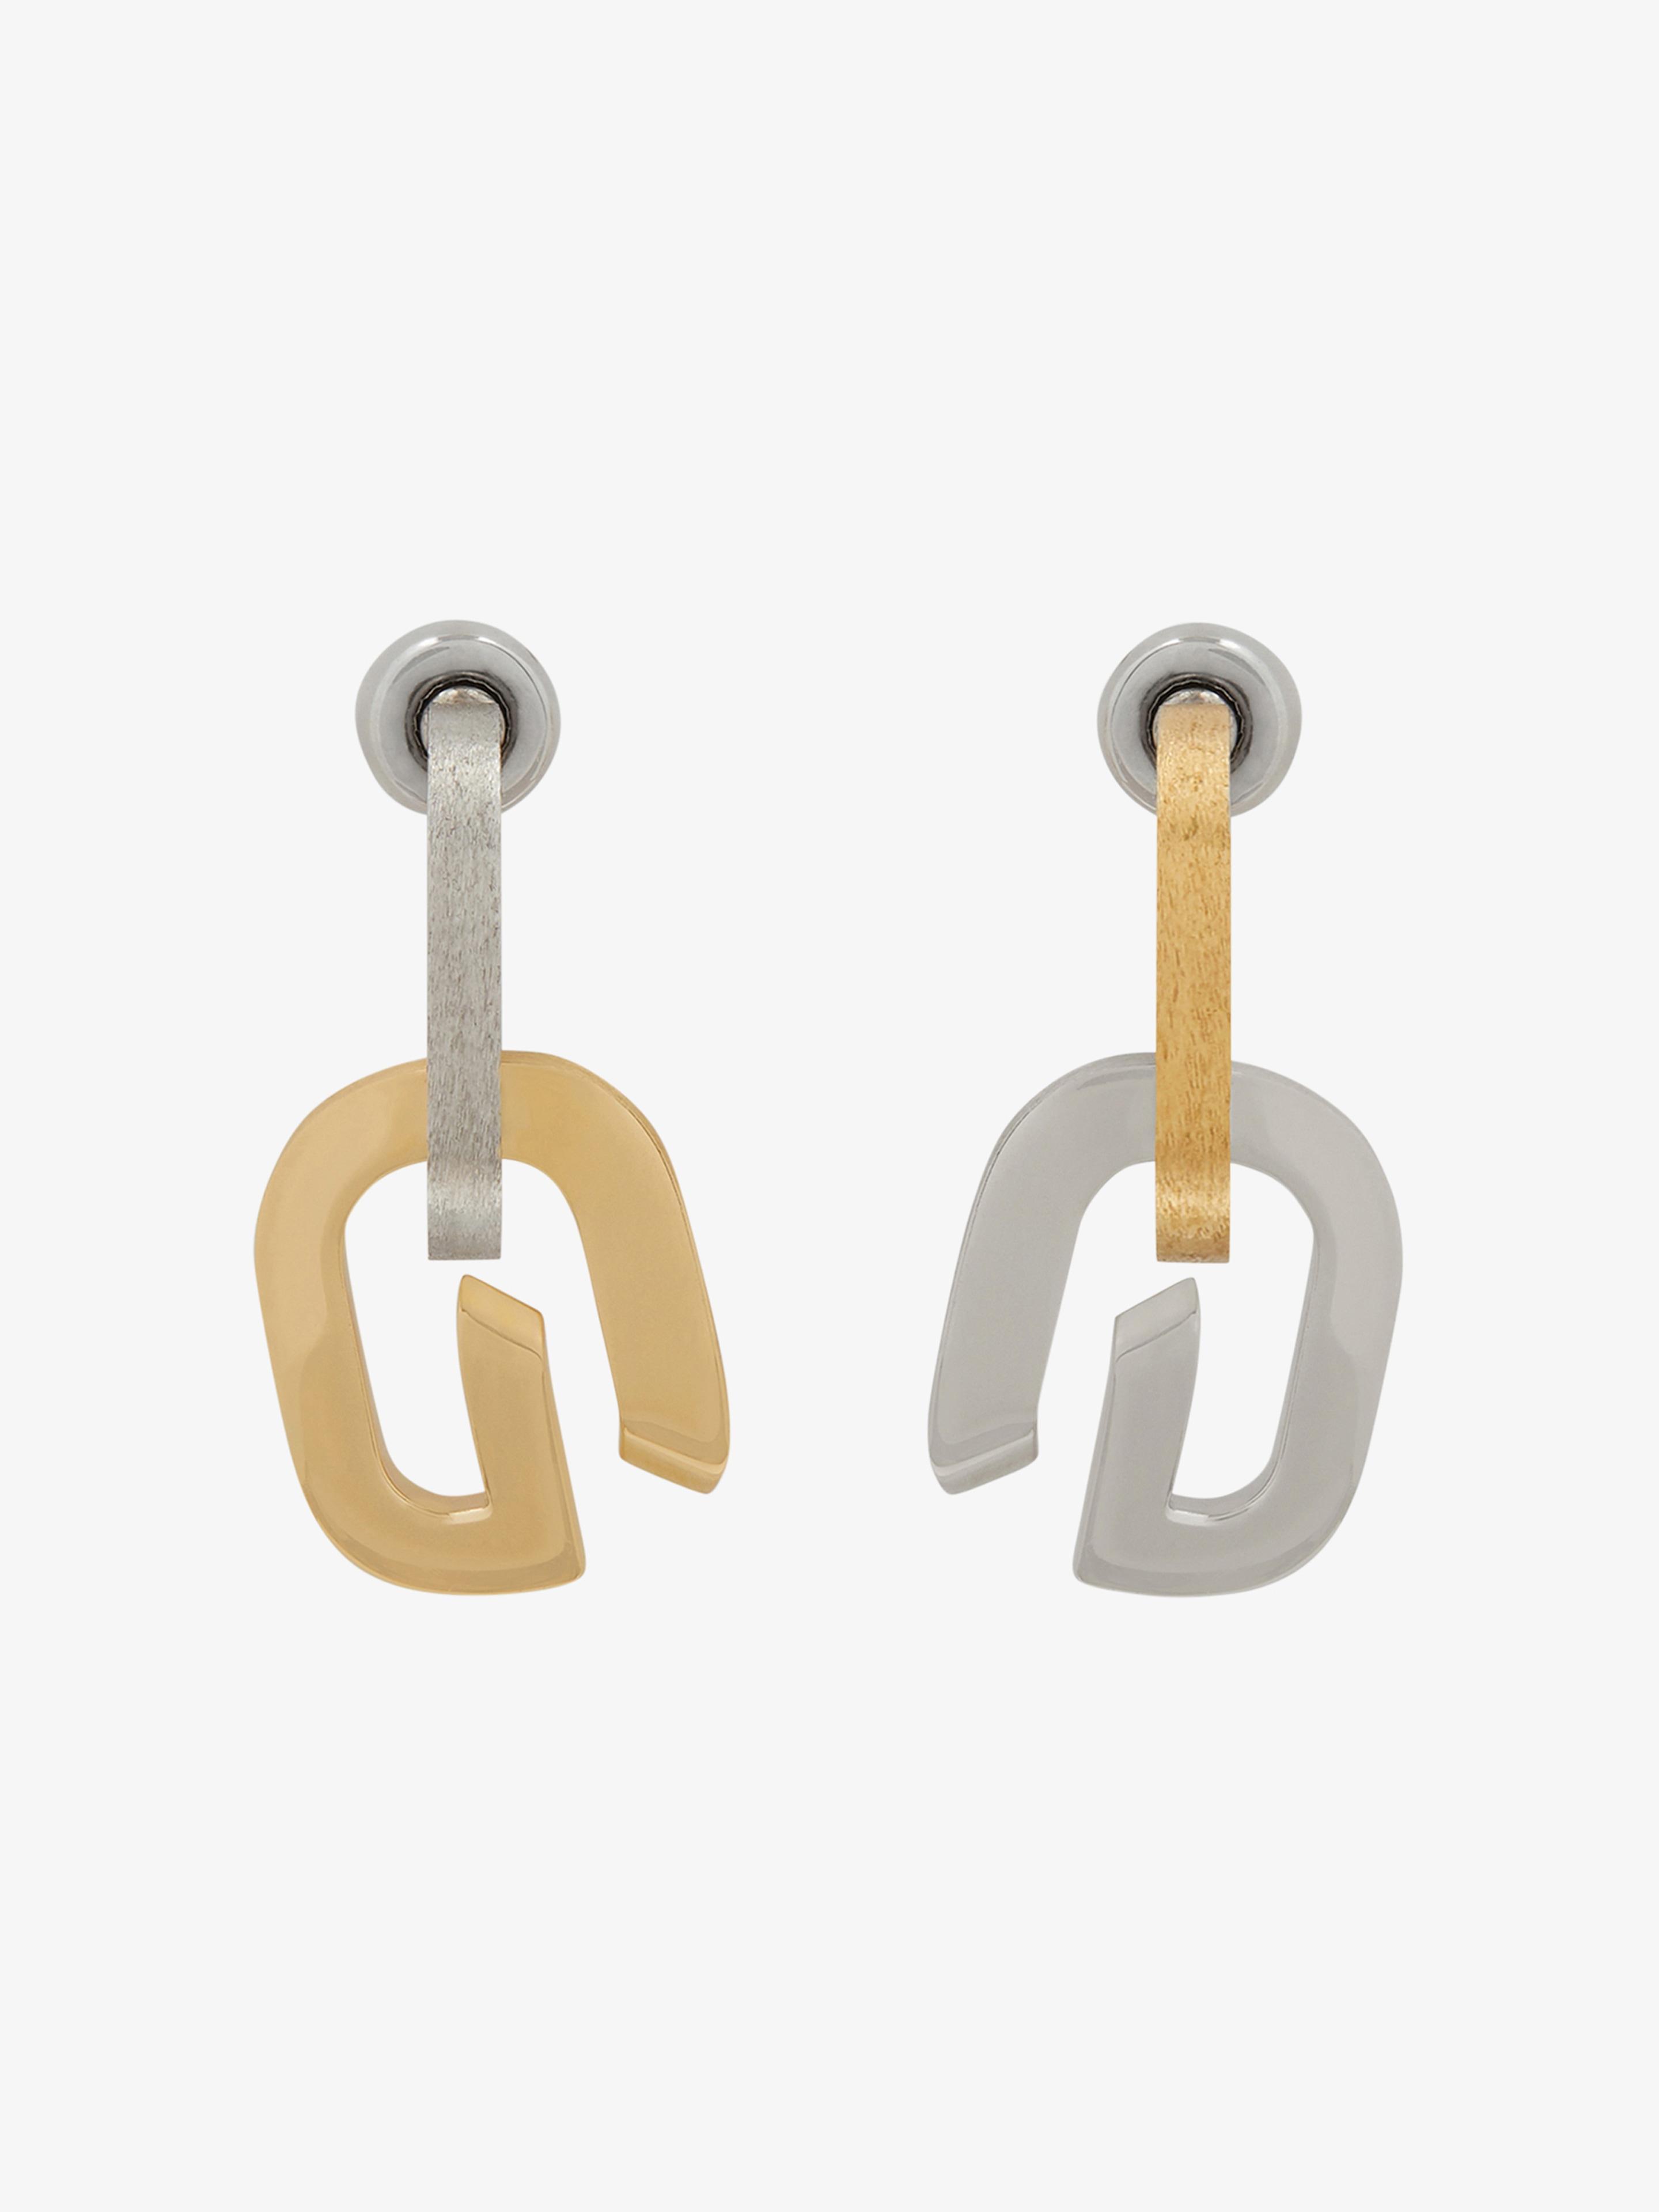 G Link earrings